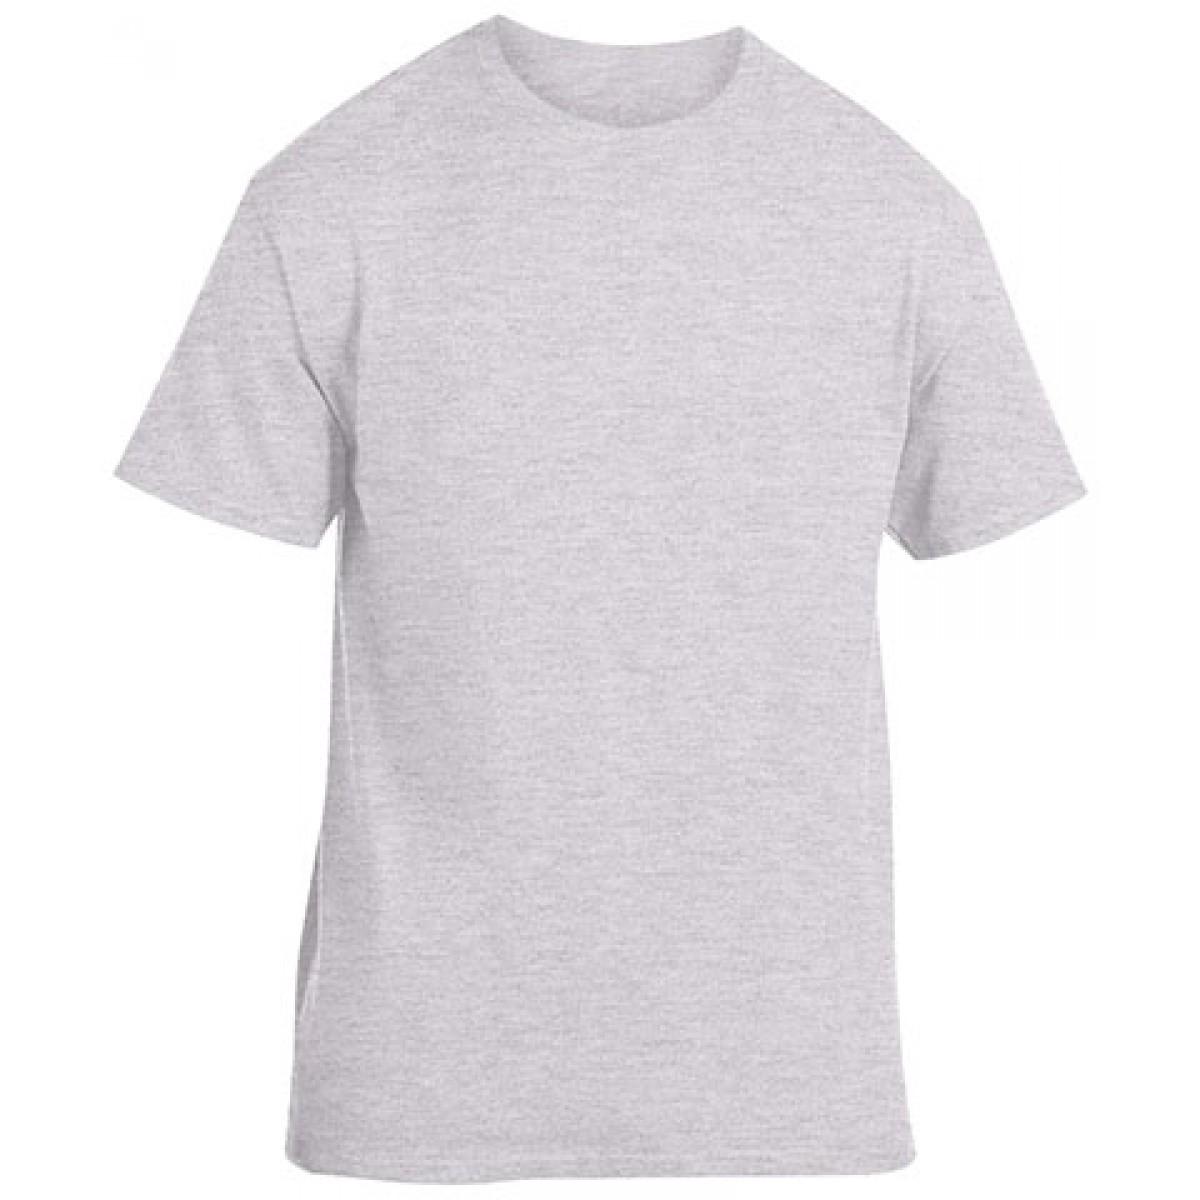 Cotton Short Sleeve T-Shirt-Sports Grey-3XL